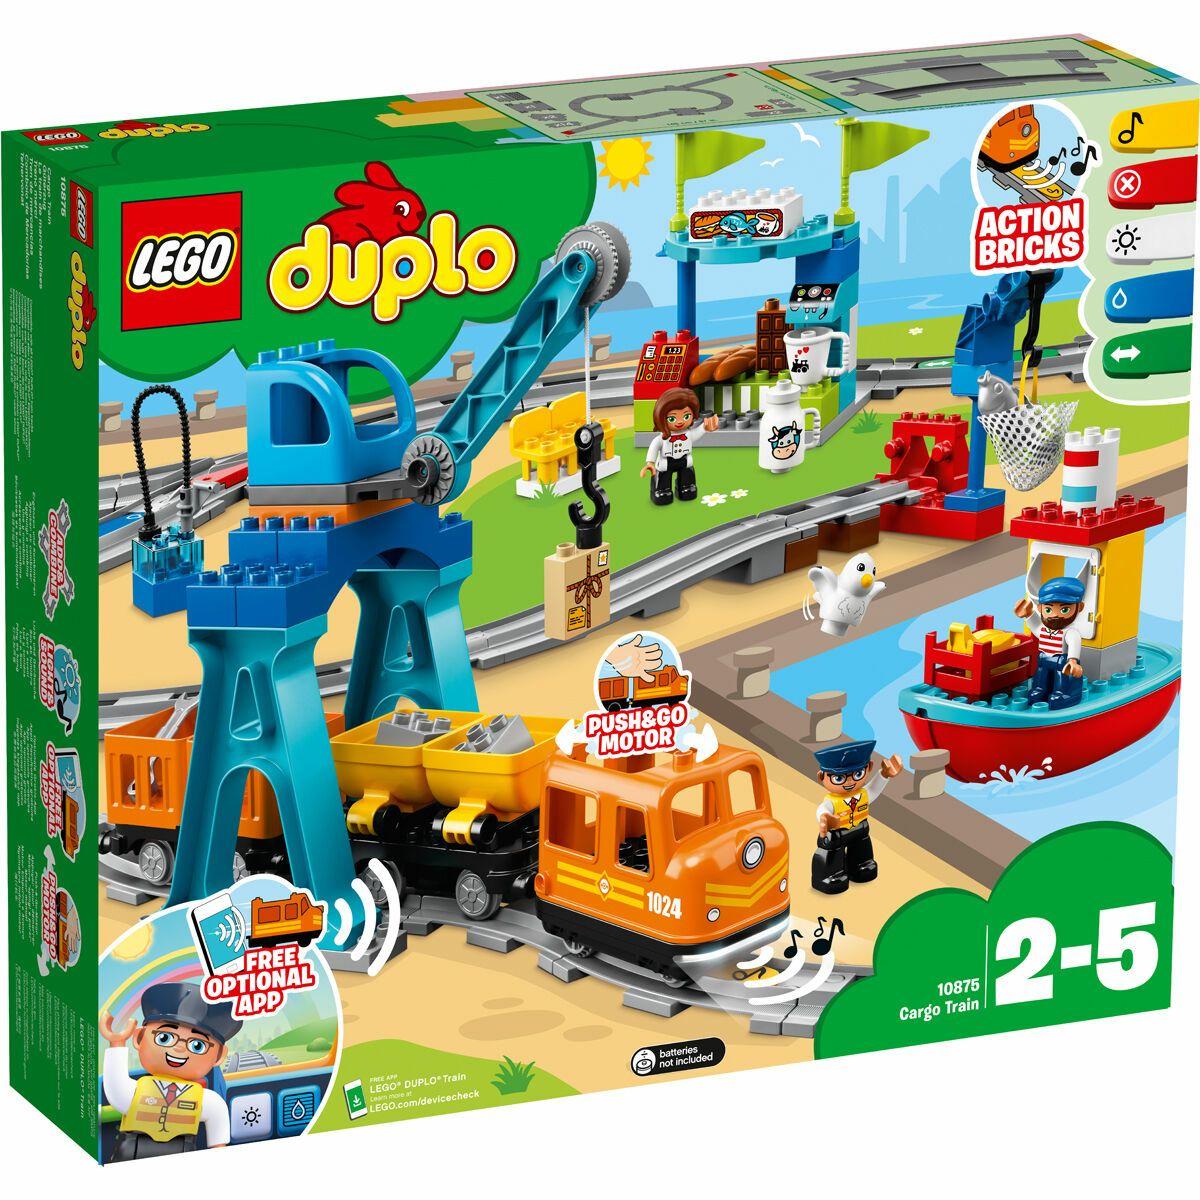 Lego Duplo 10875 Güterzug Galeria Kundenkartendeal